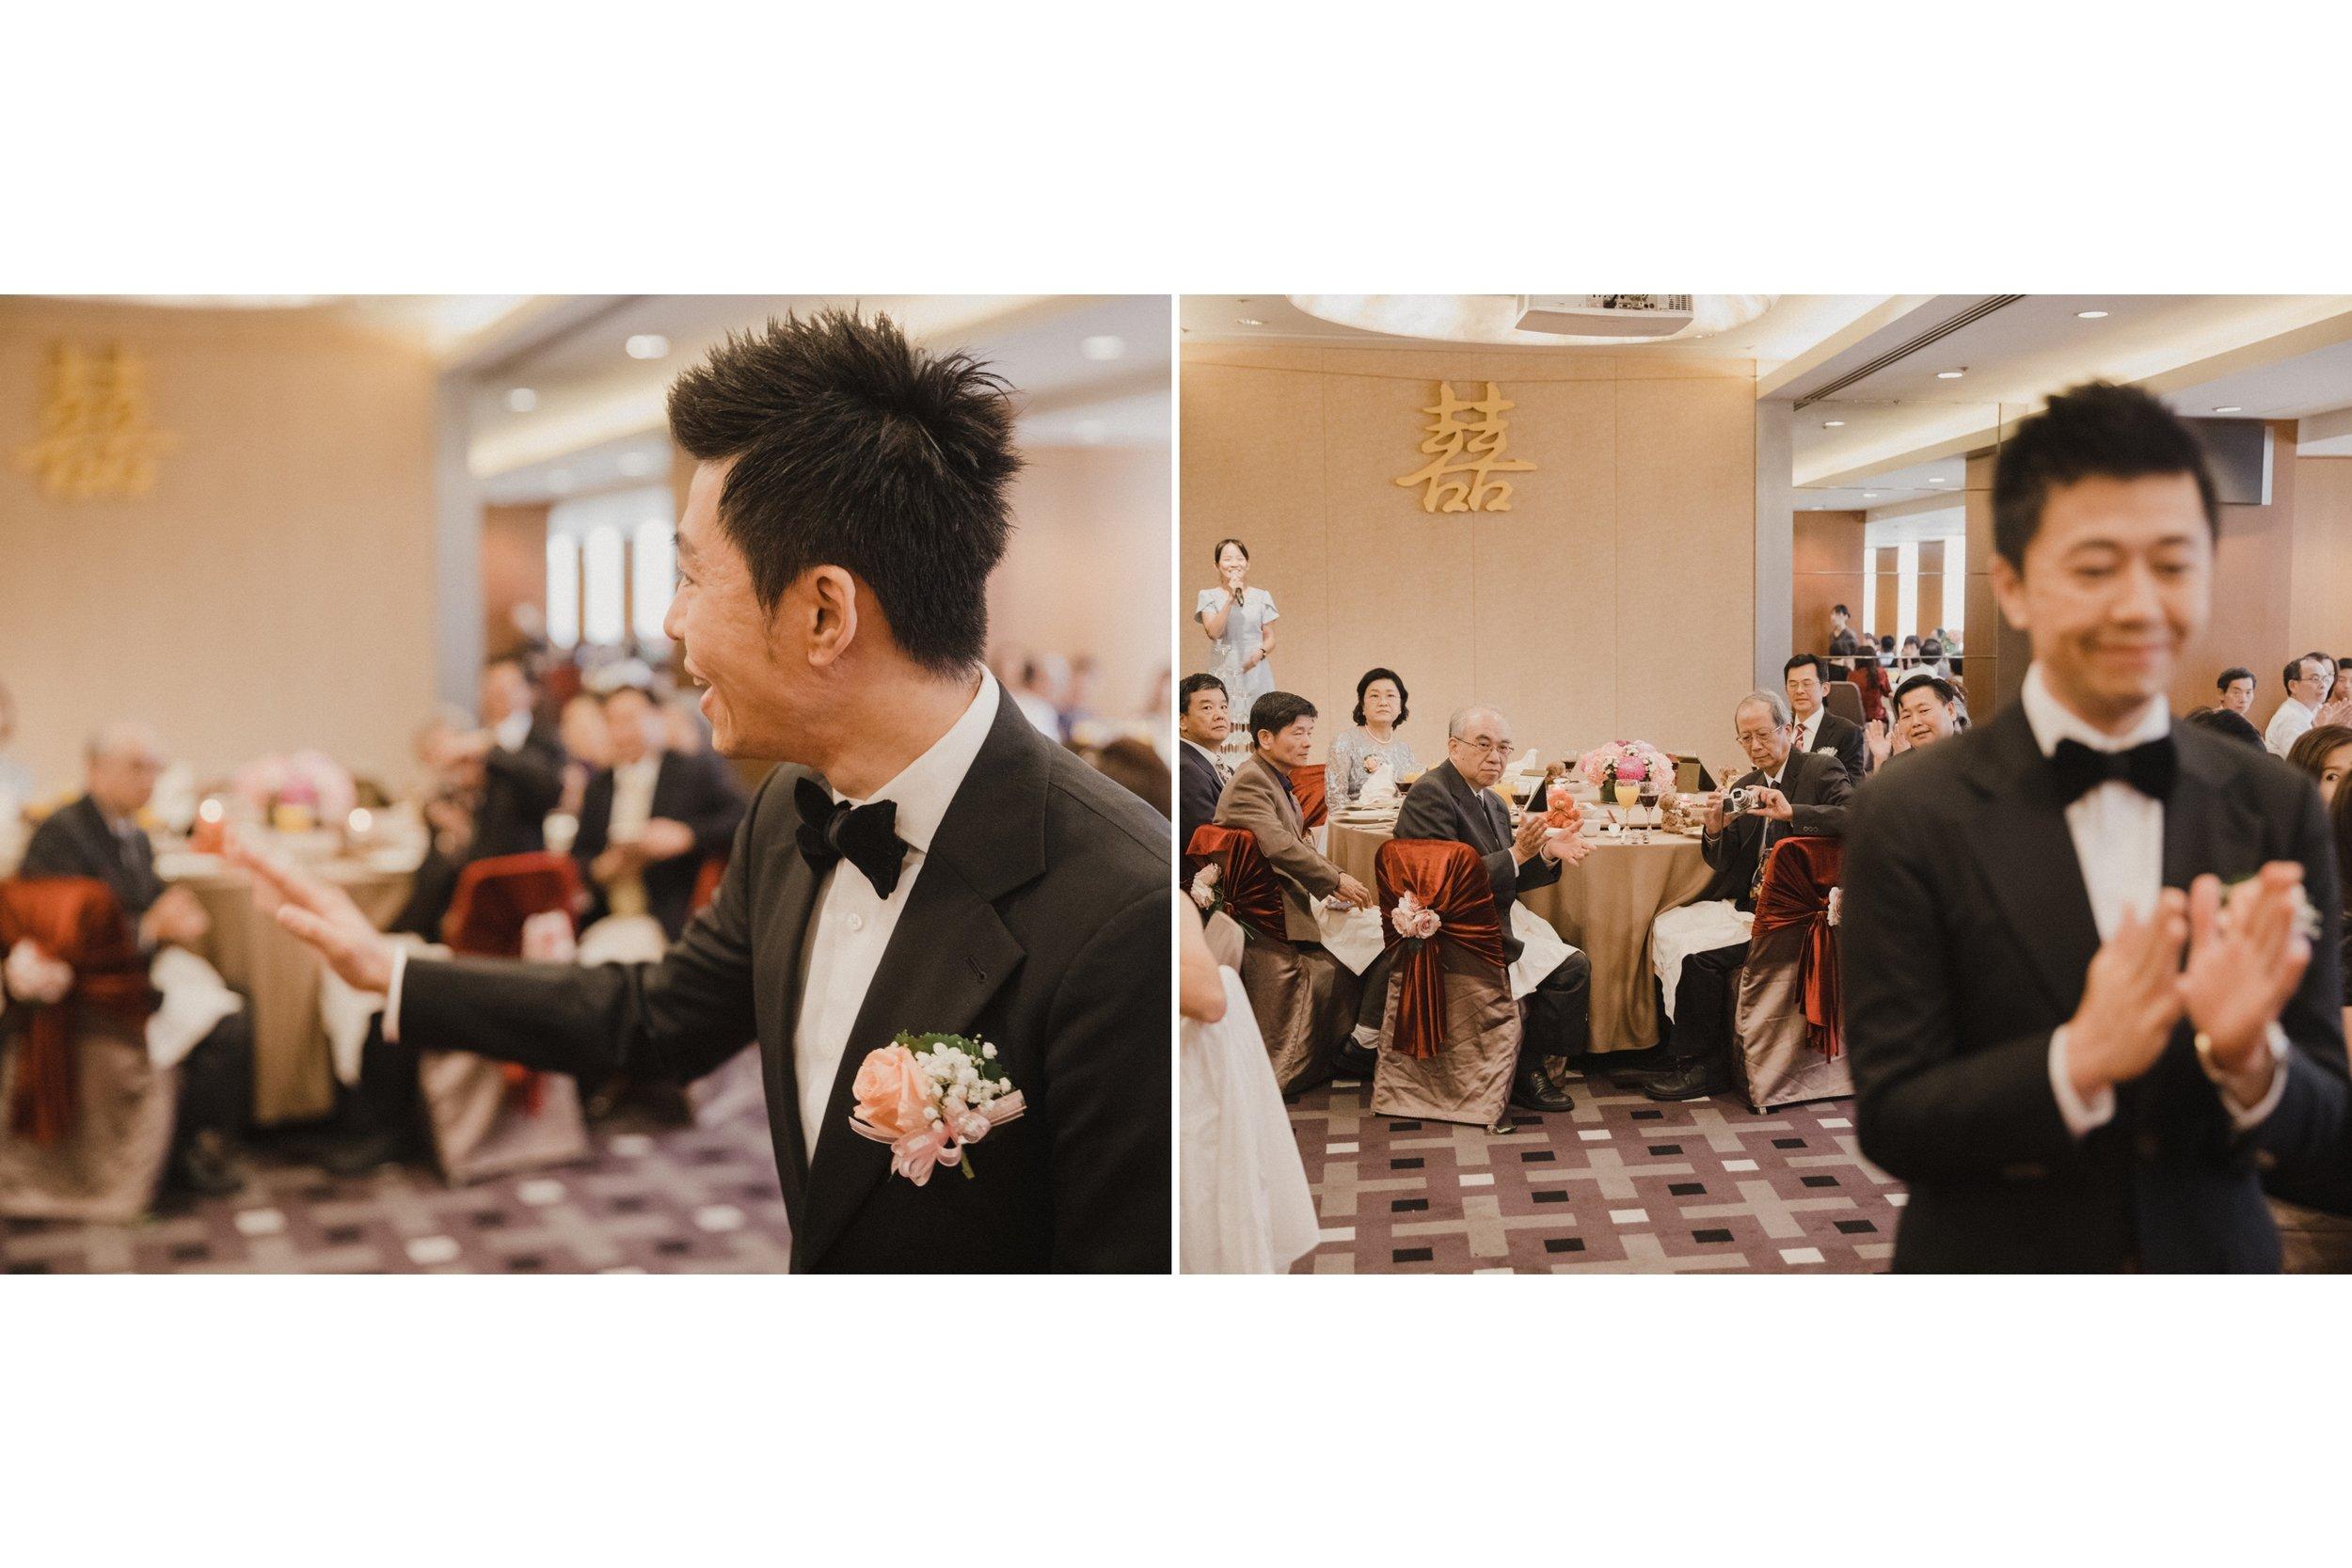 wedding-caridee-oscar-lunch-ambassador-hsinchu-結婚午宴-新竹國賓_59.jpg